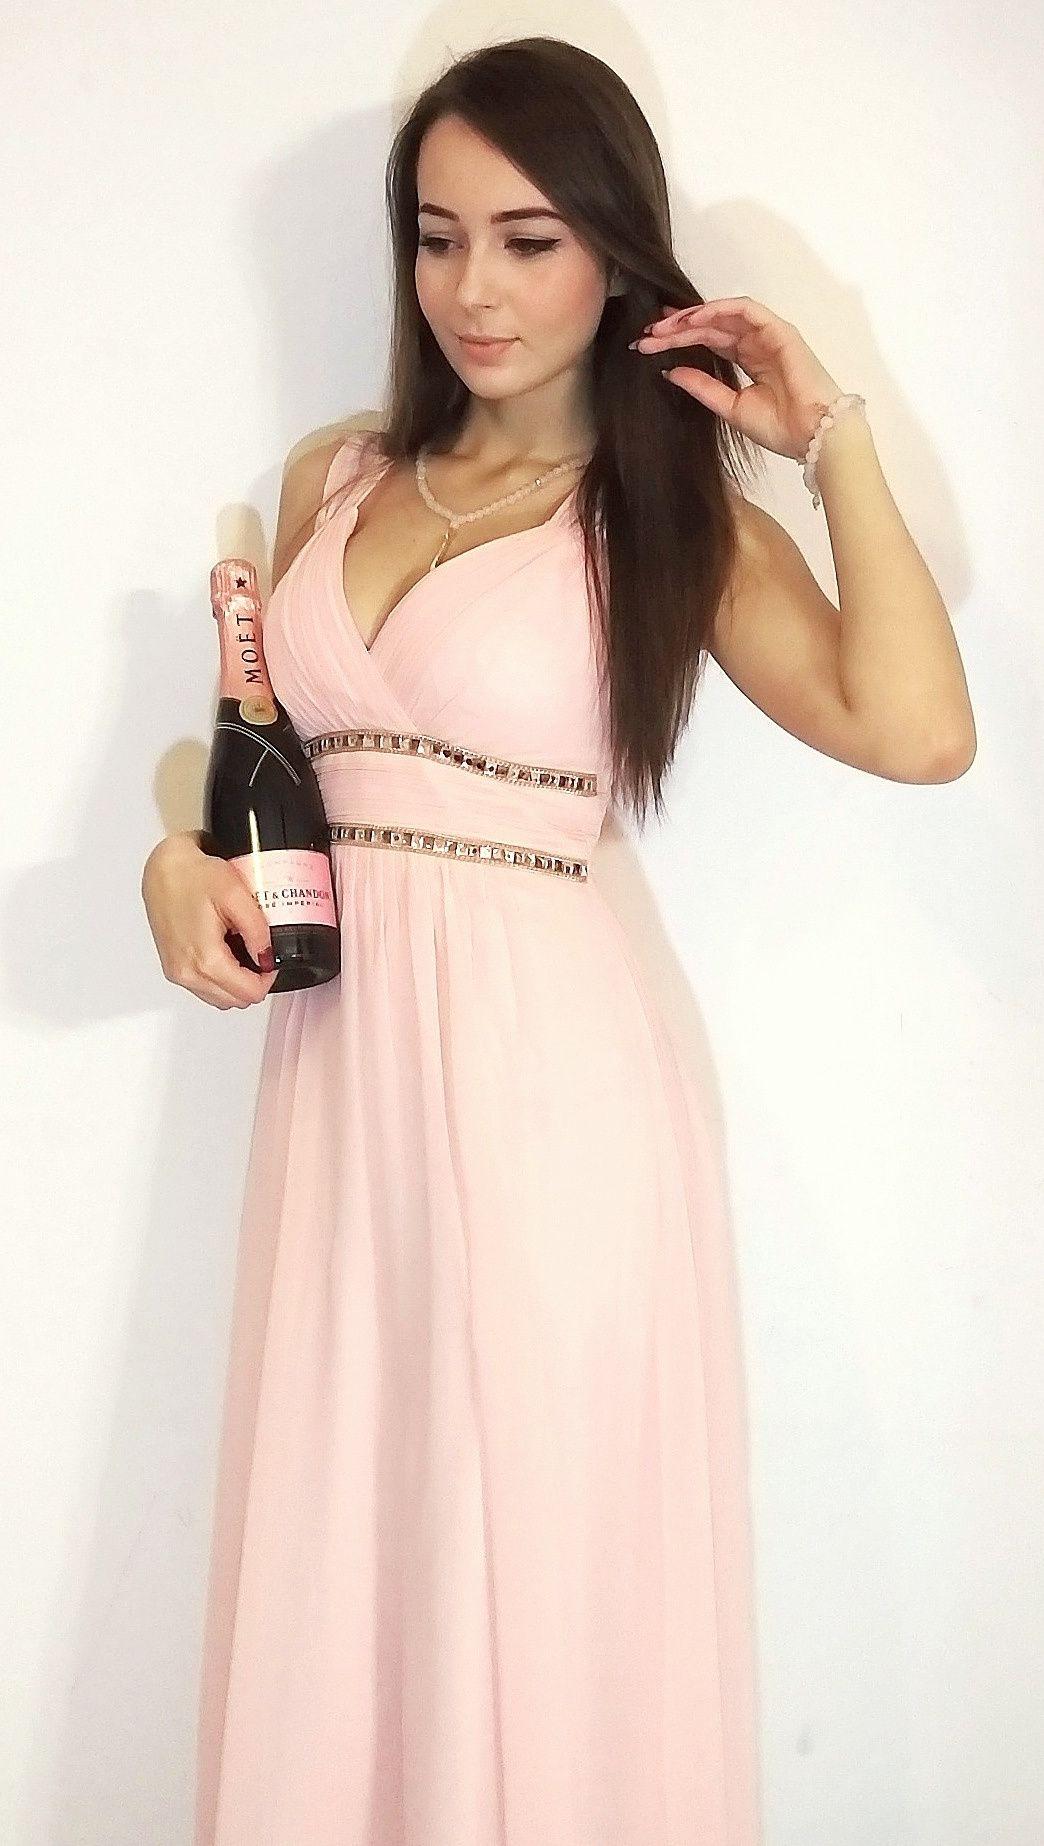 Sleeveless grecian style evening dress gowns pinterest perfect